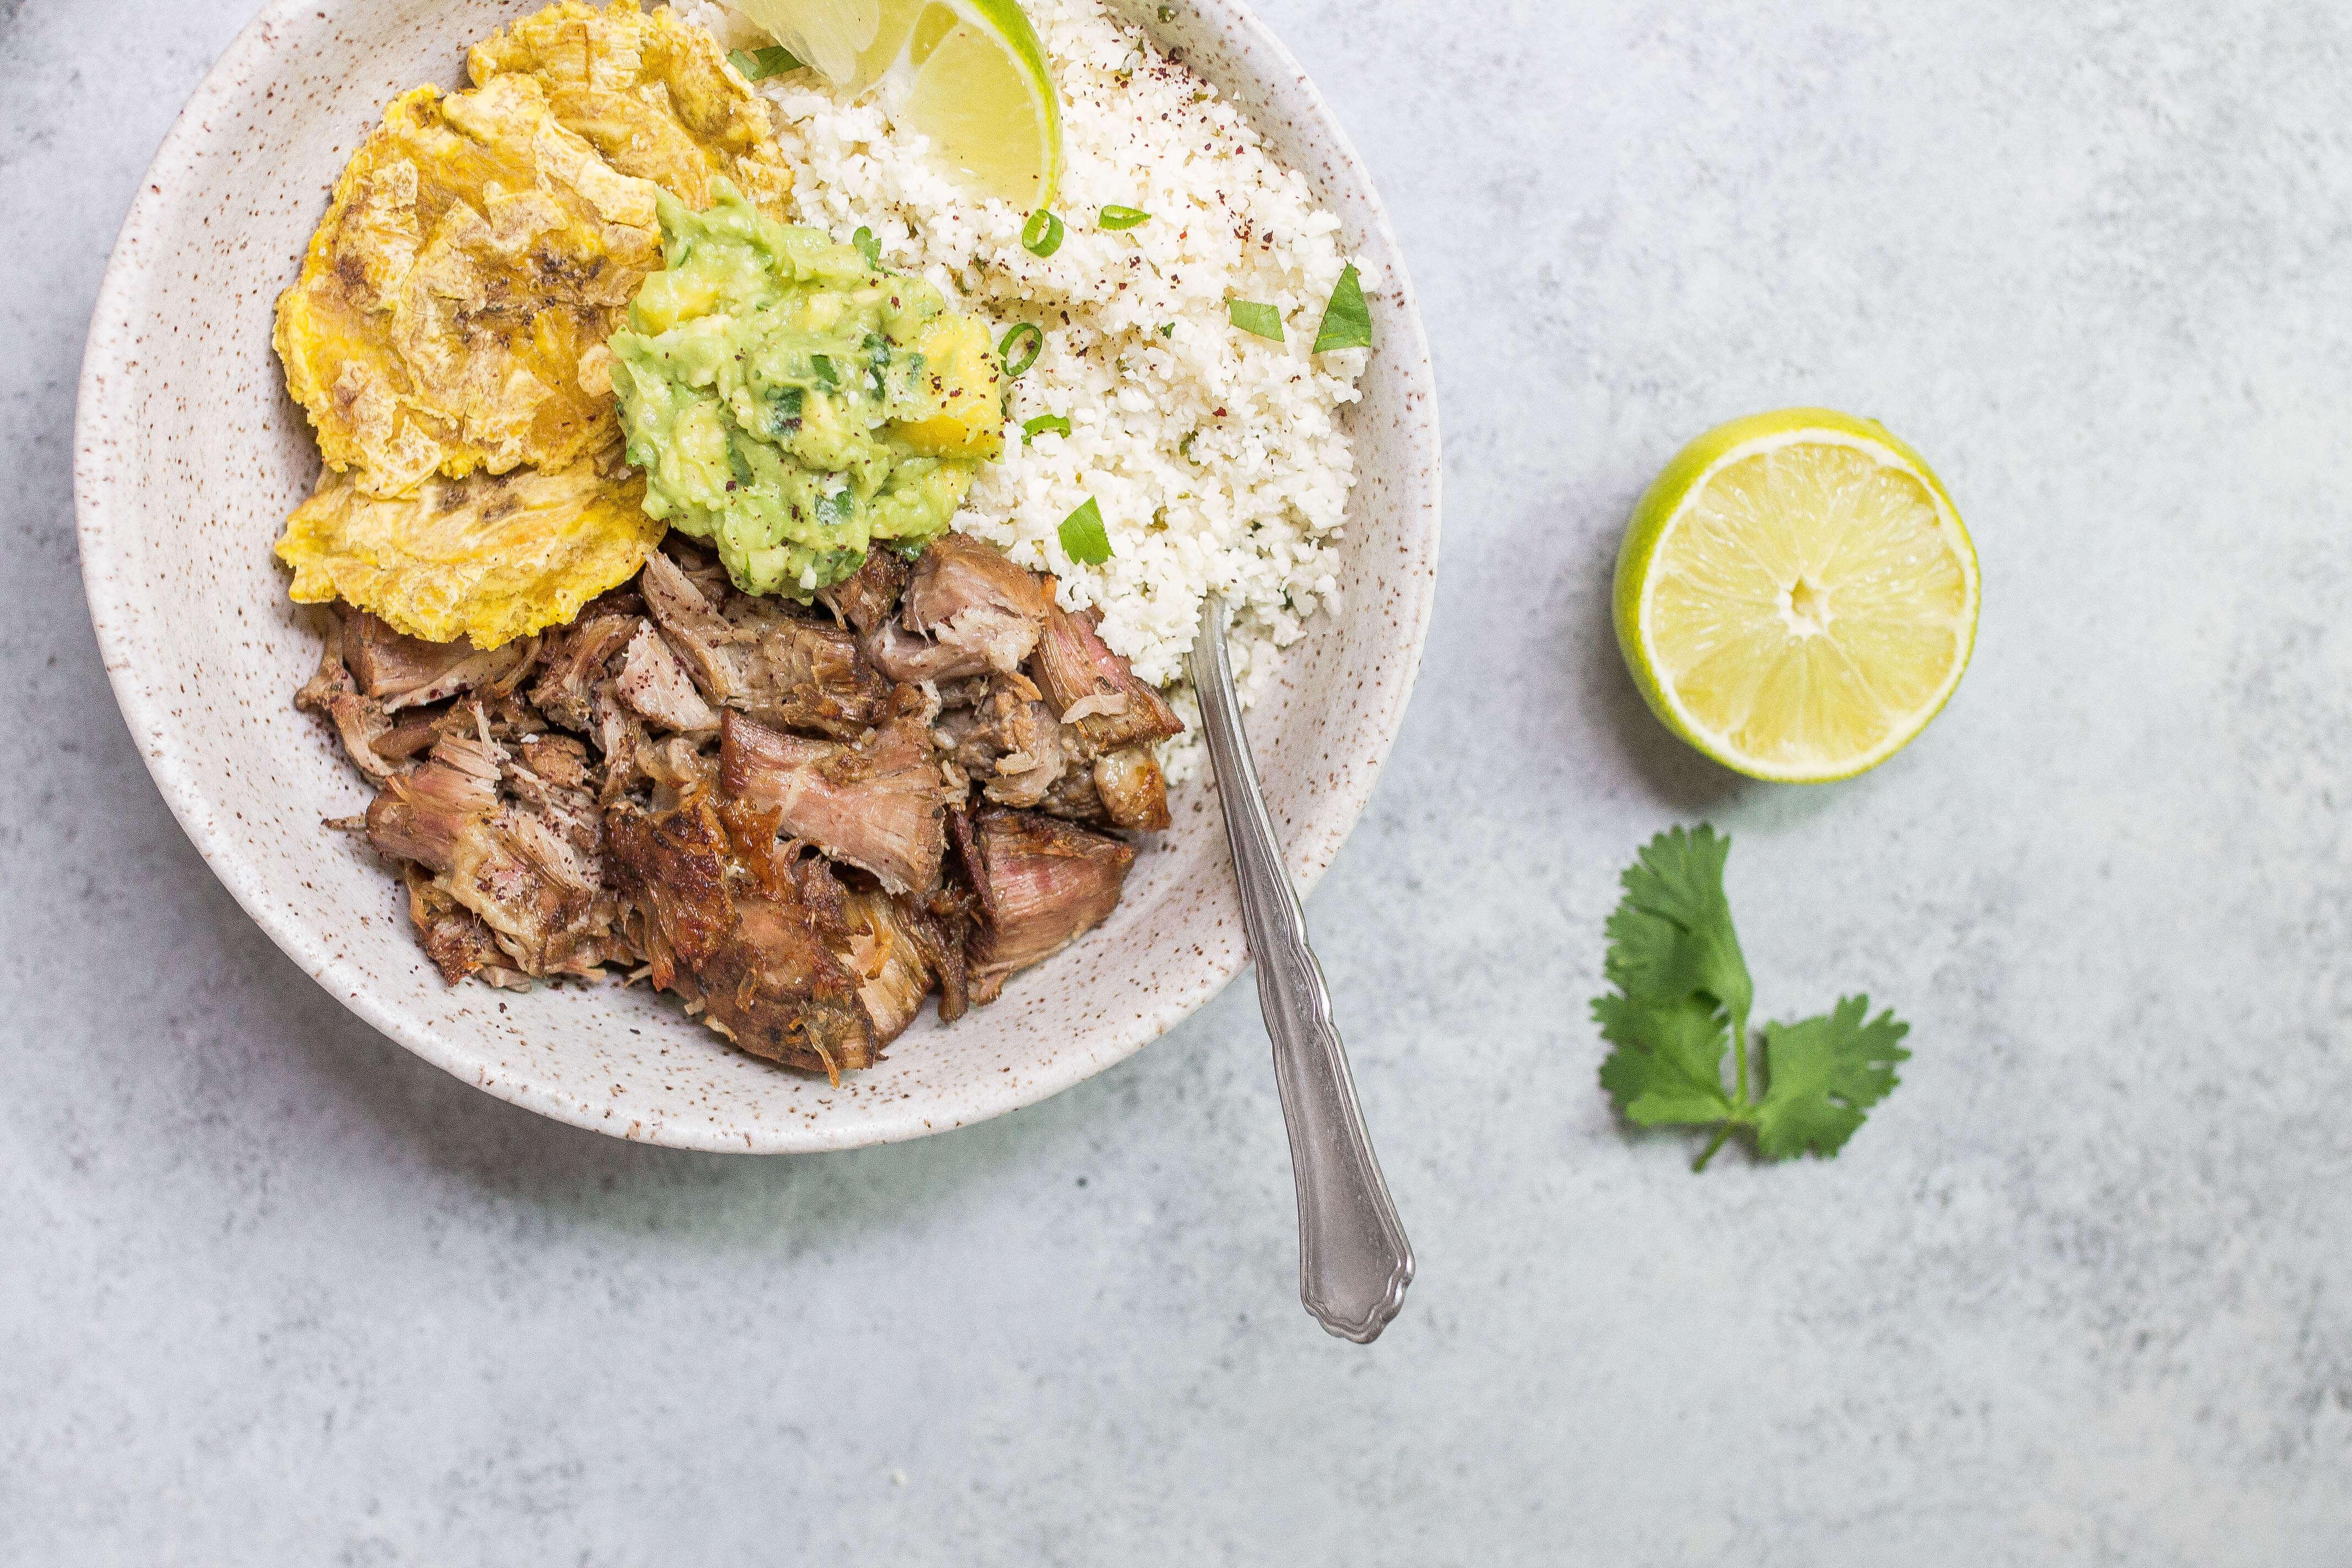 Paleo Carnitas Bowl (Crispy Pulled Pork) (AIP, Grain-free)